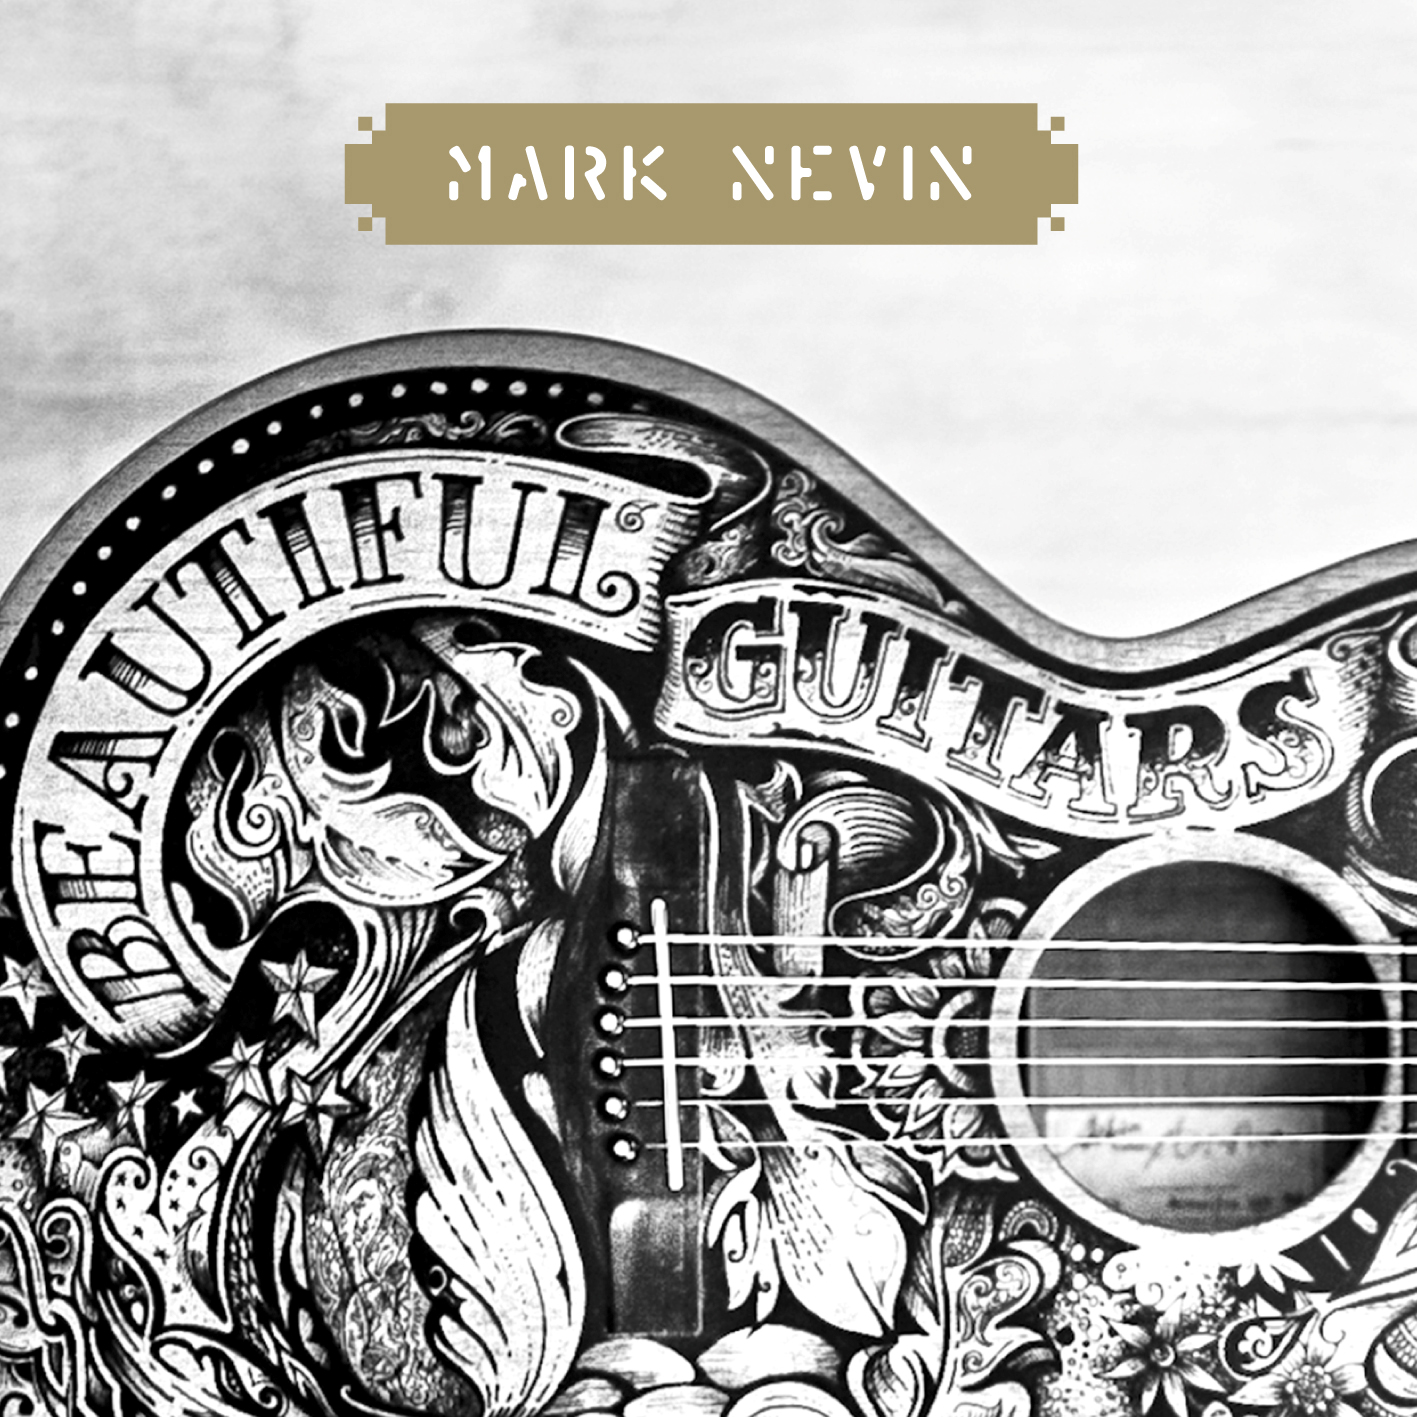 Beautiful Guitars (Signed CD / Vinyl or Download) [2014] - Mark Nevin